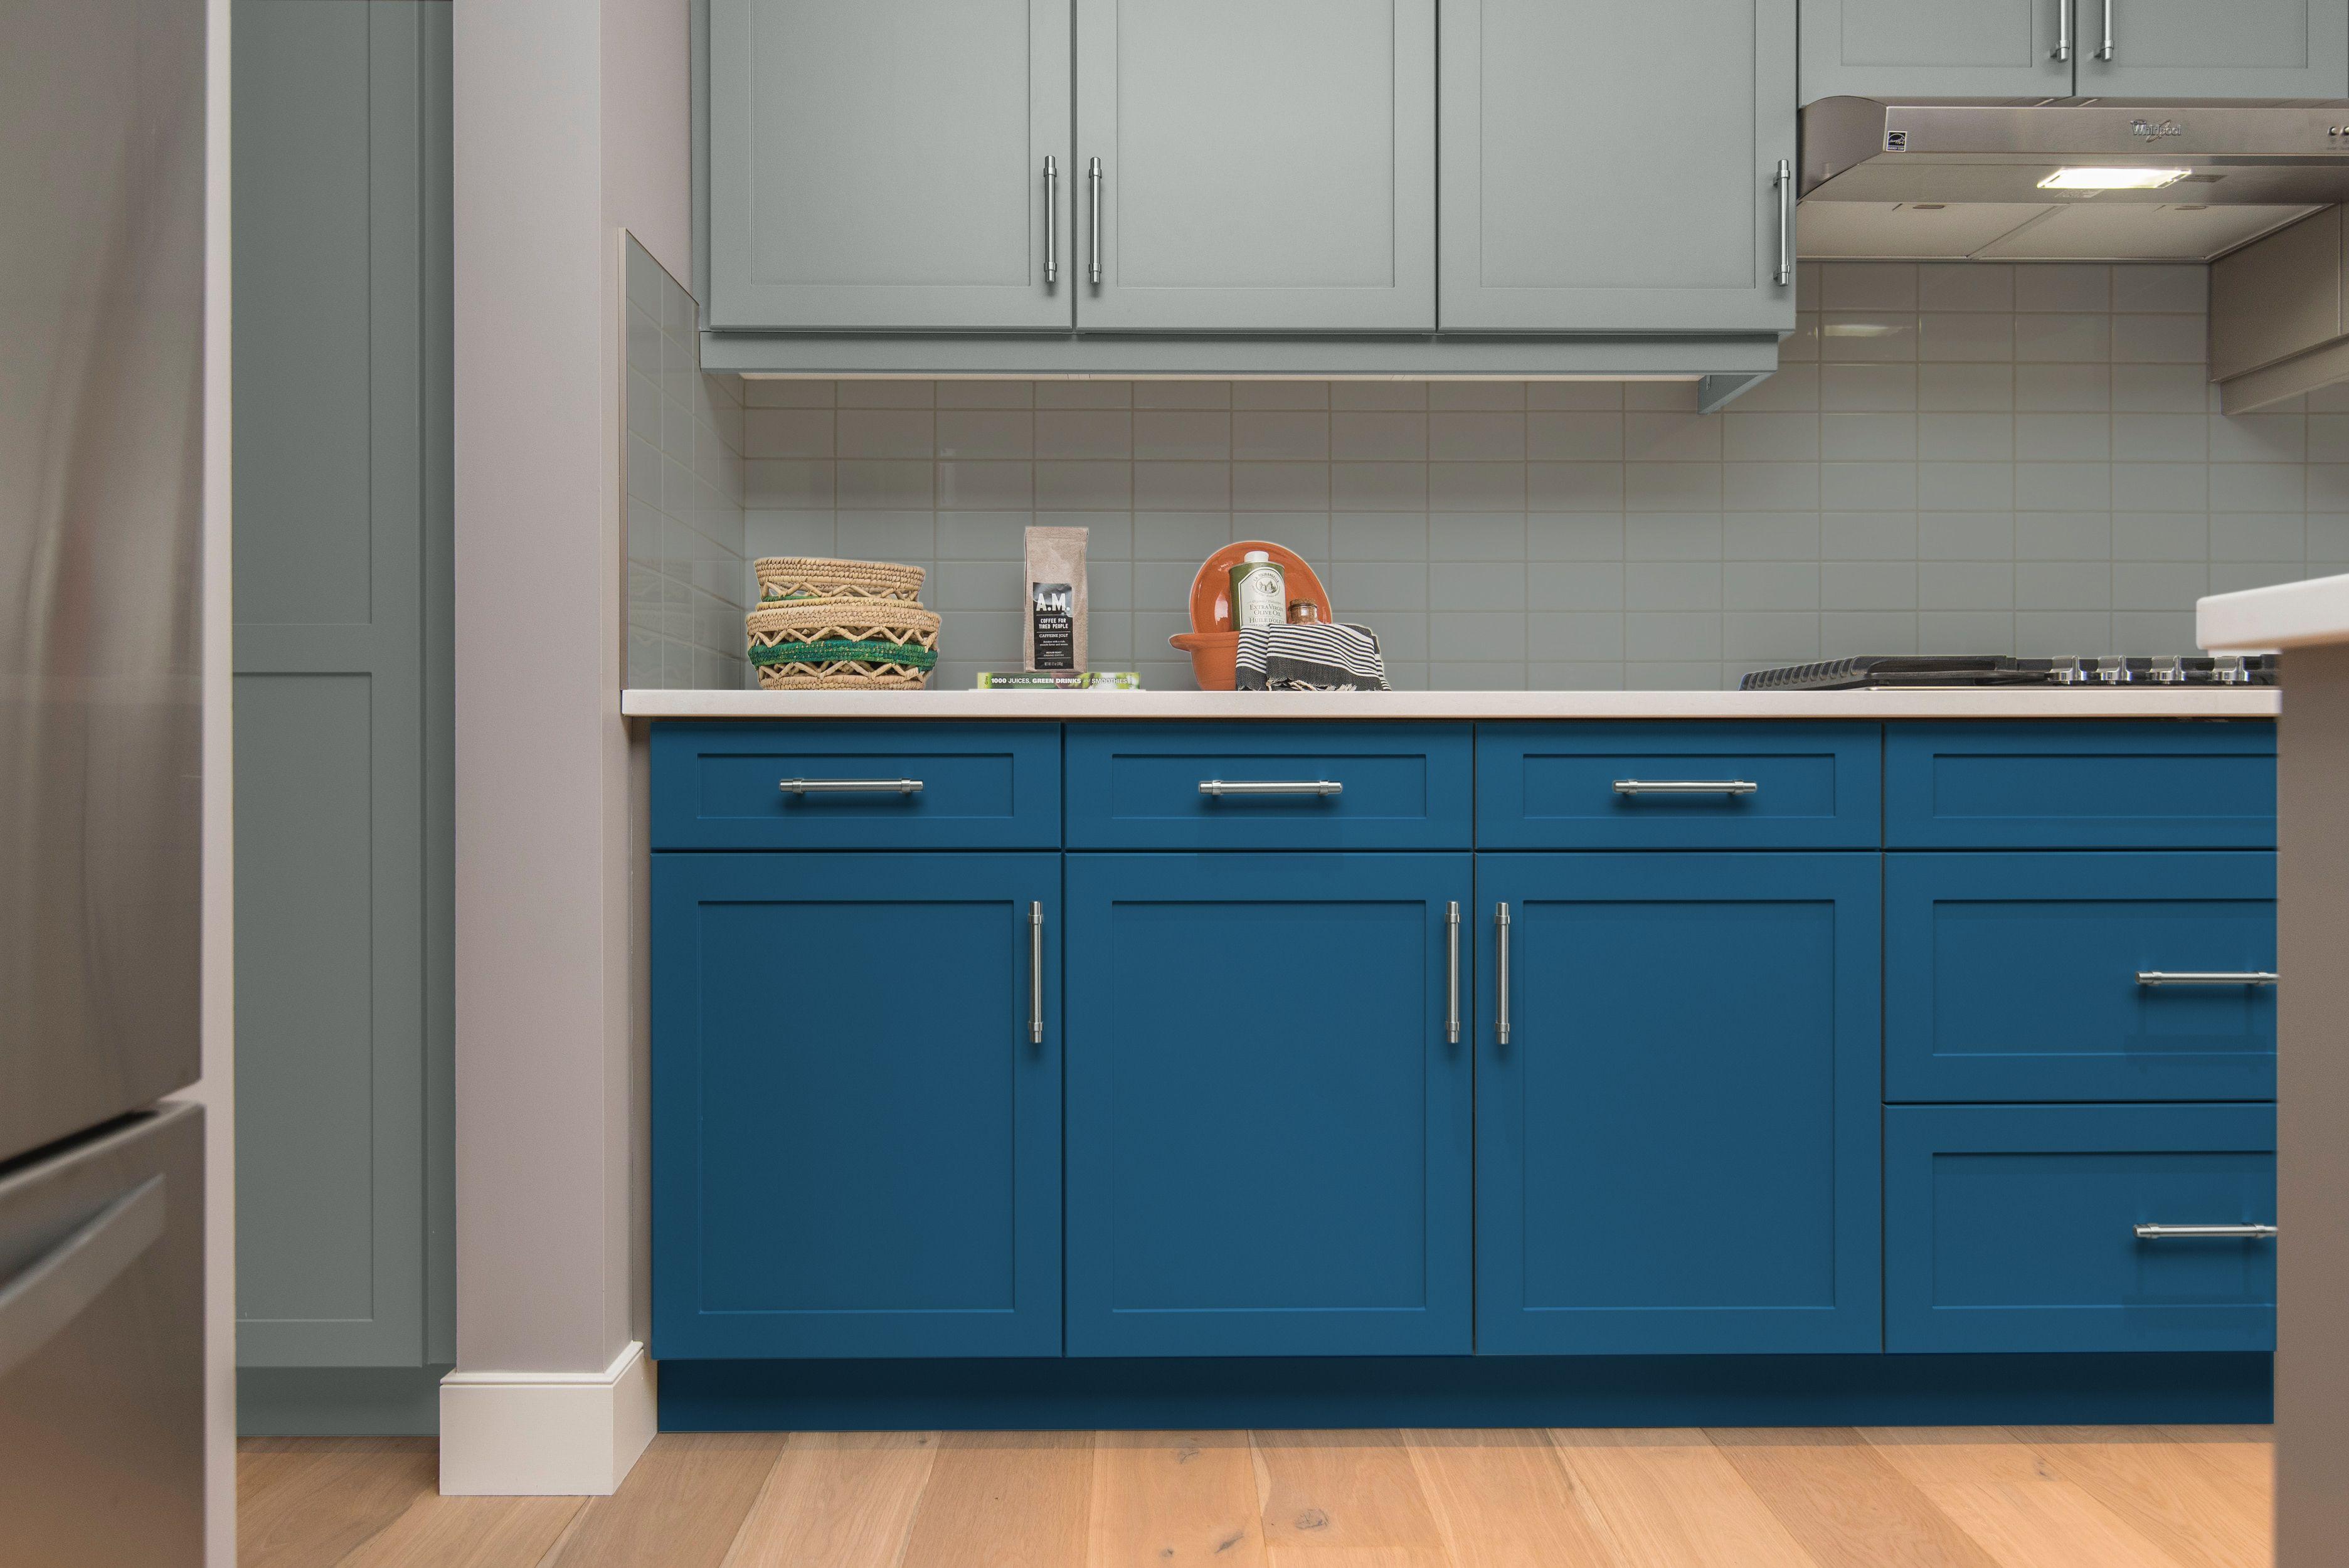 Kitchen Interior Colours Teal Kitchen Cabinets Kitchen Cupboards Paint Interior Design Kitchen